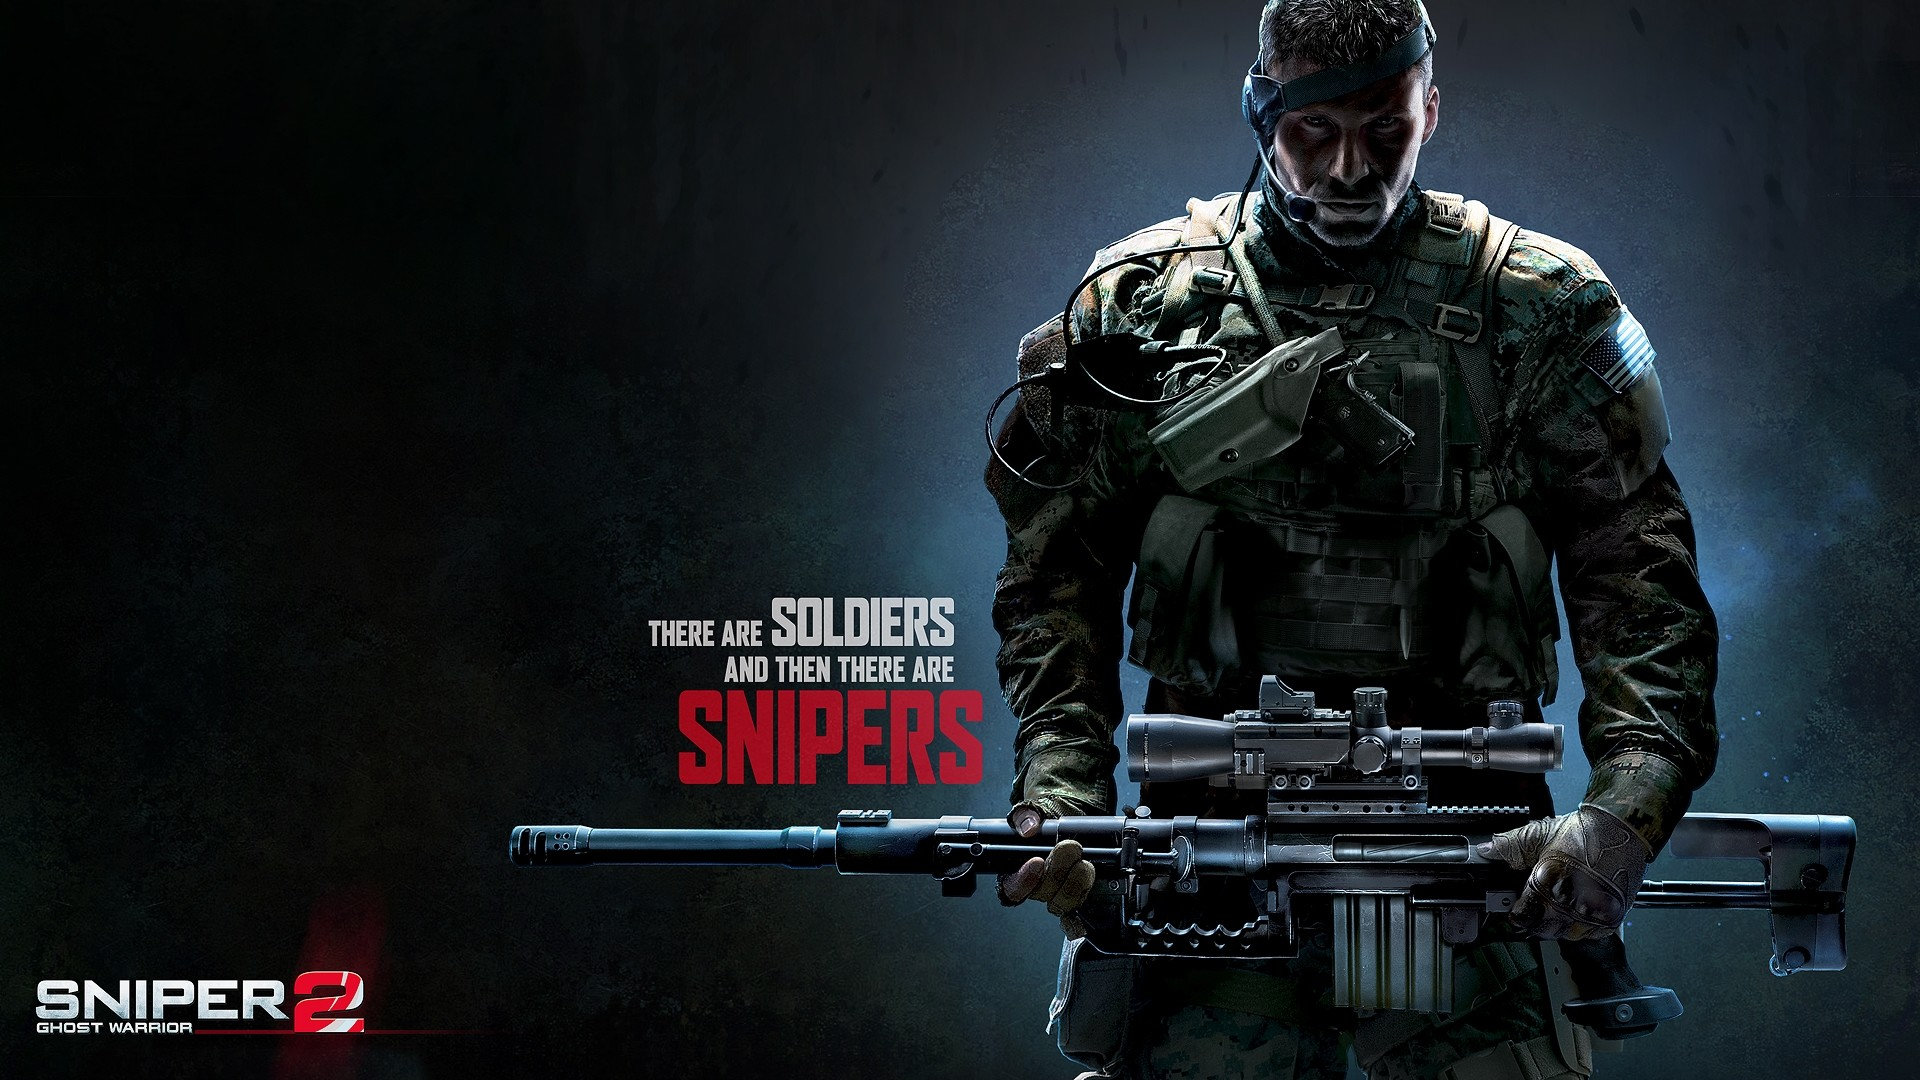 wallpaper Sniper Ghost Warrior Games Wallpaper 3D Free HD Images . …